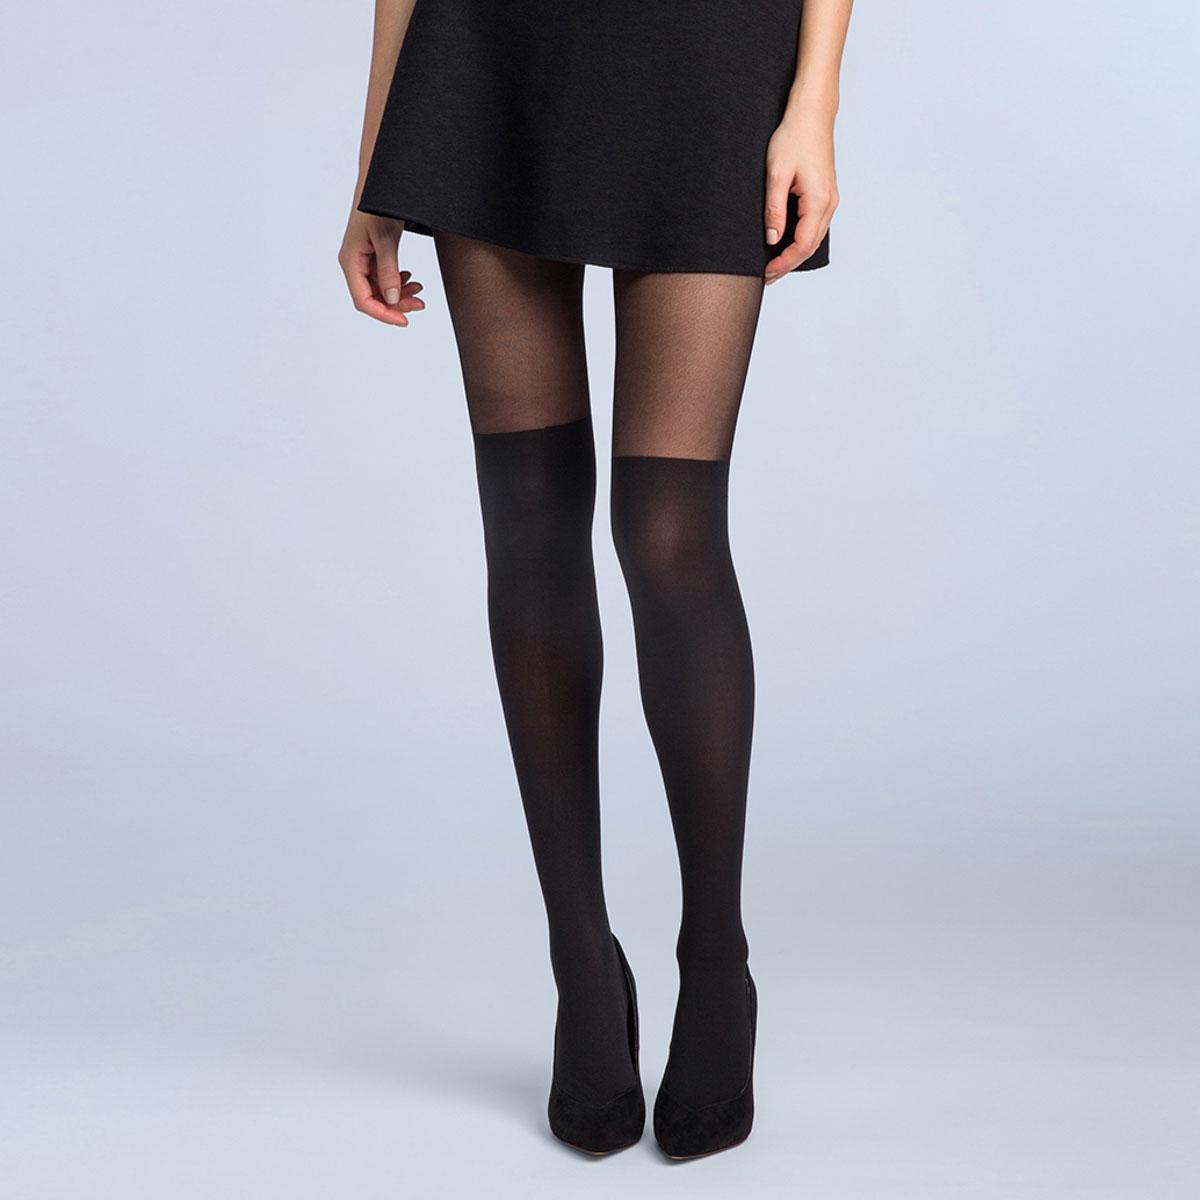 Collant cuissarde noir Style